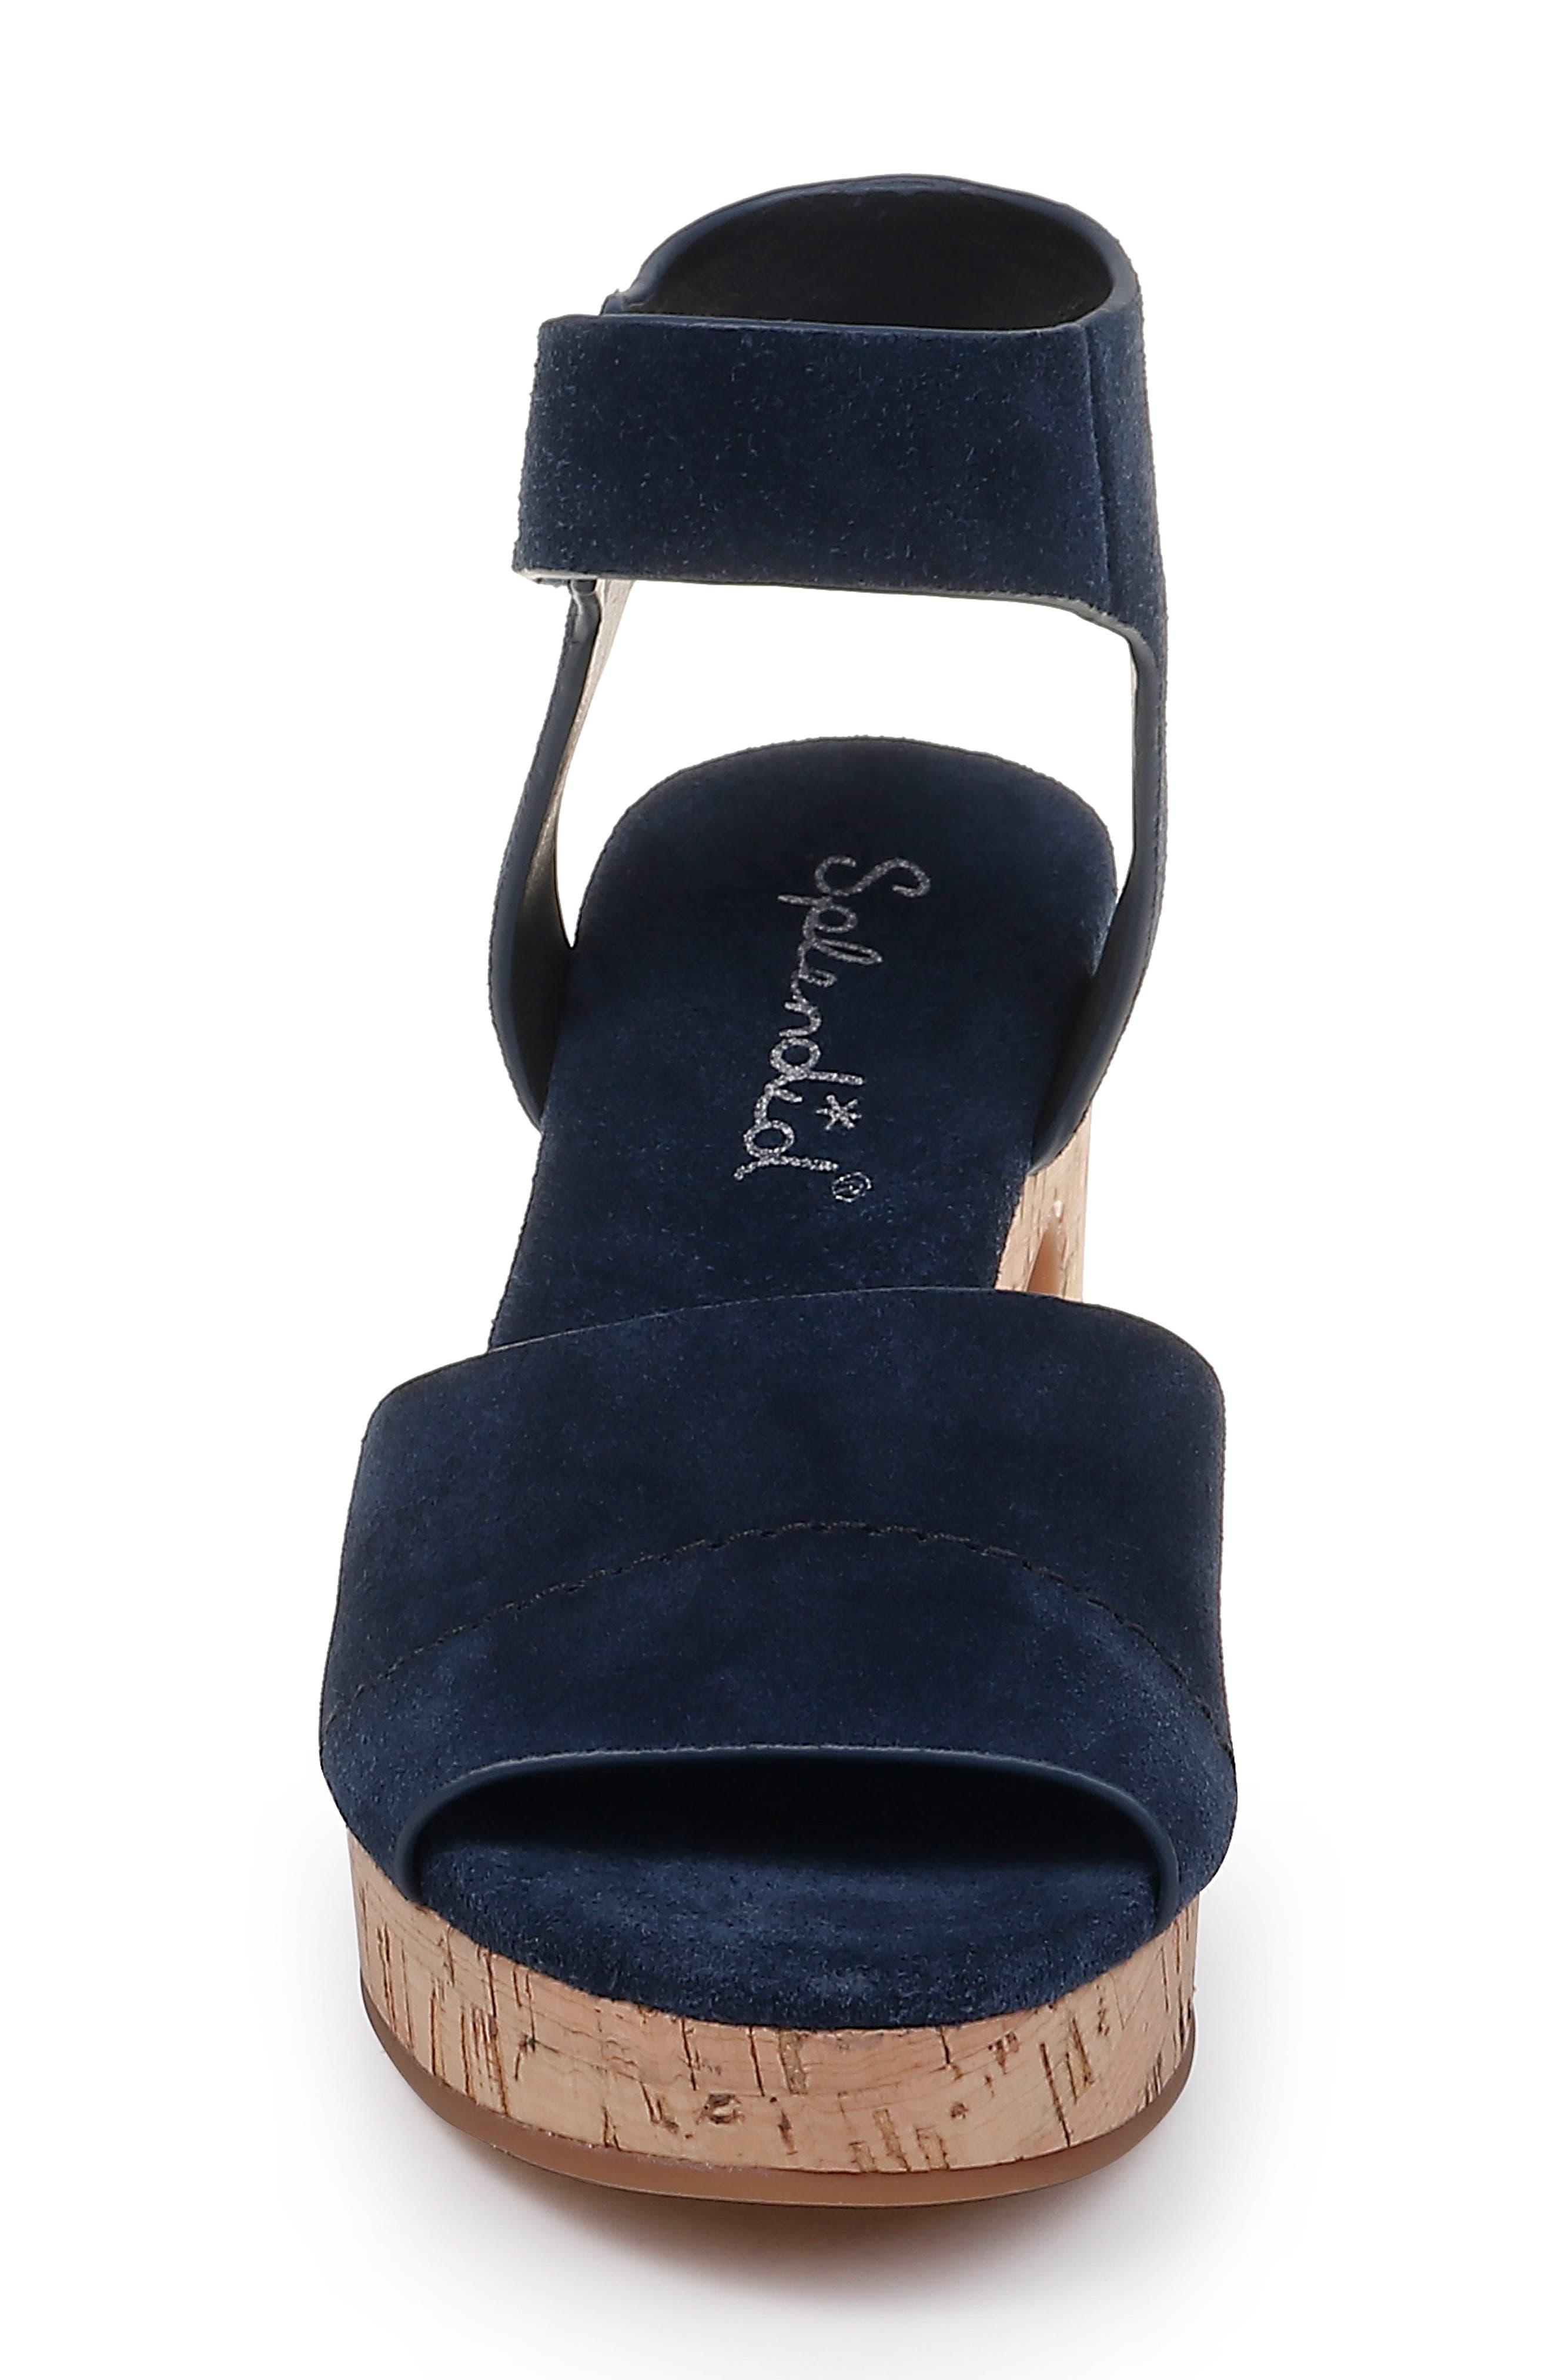 SPLENDID, Thatcher Platform Ankle Strap Sandal, Alternate thumbnail 4, color, NAVY SUEDE